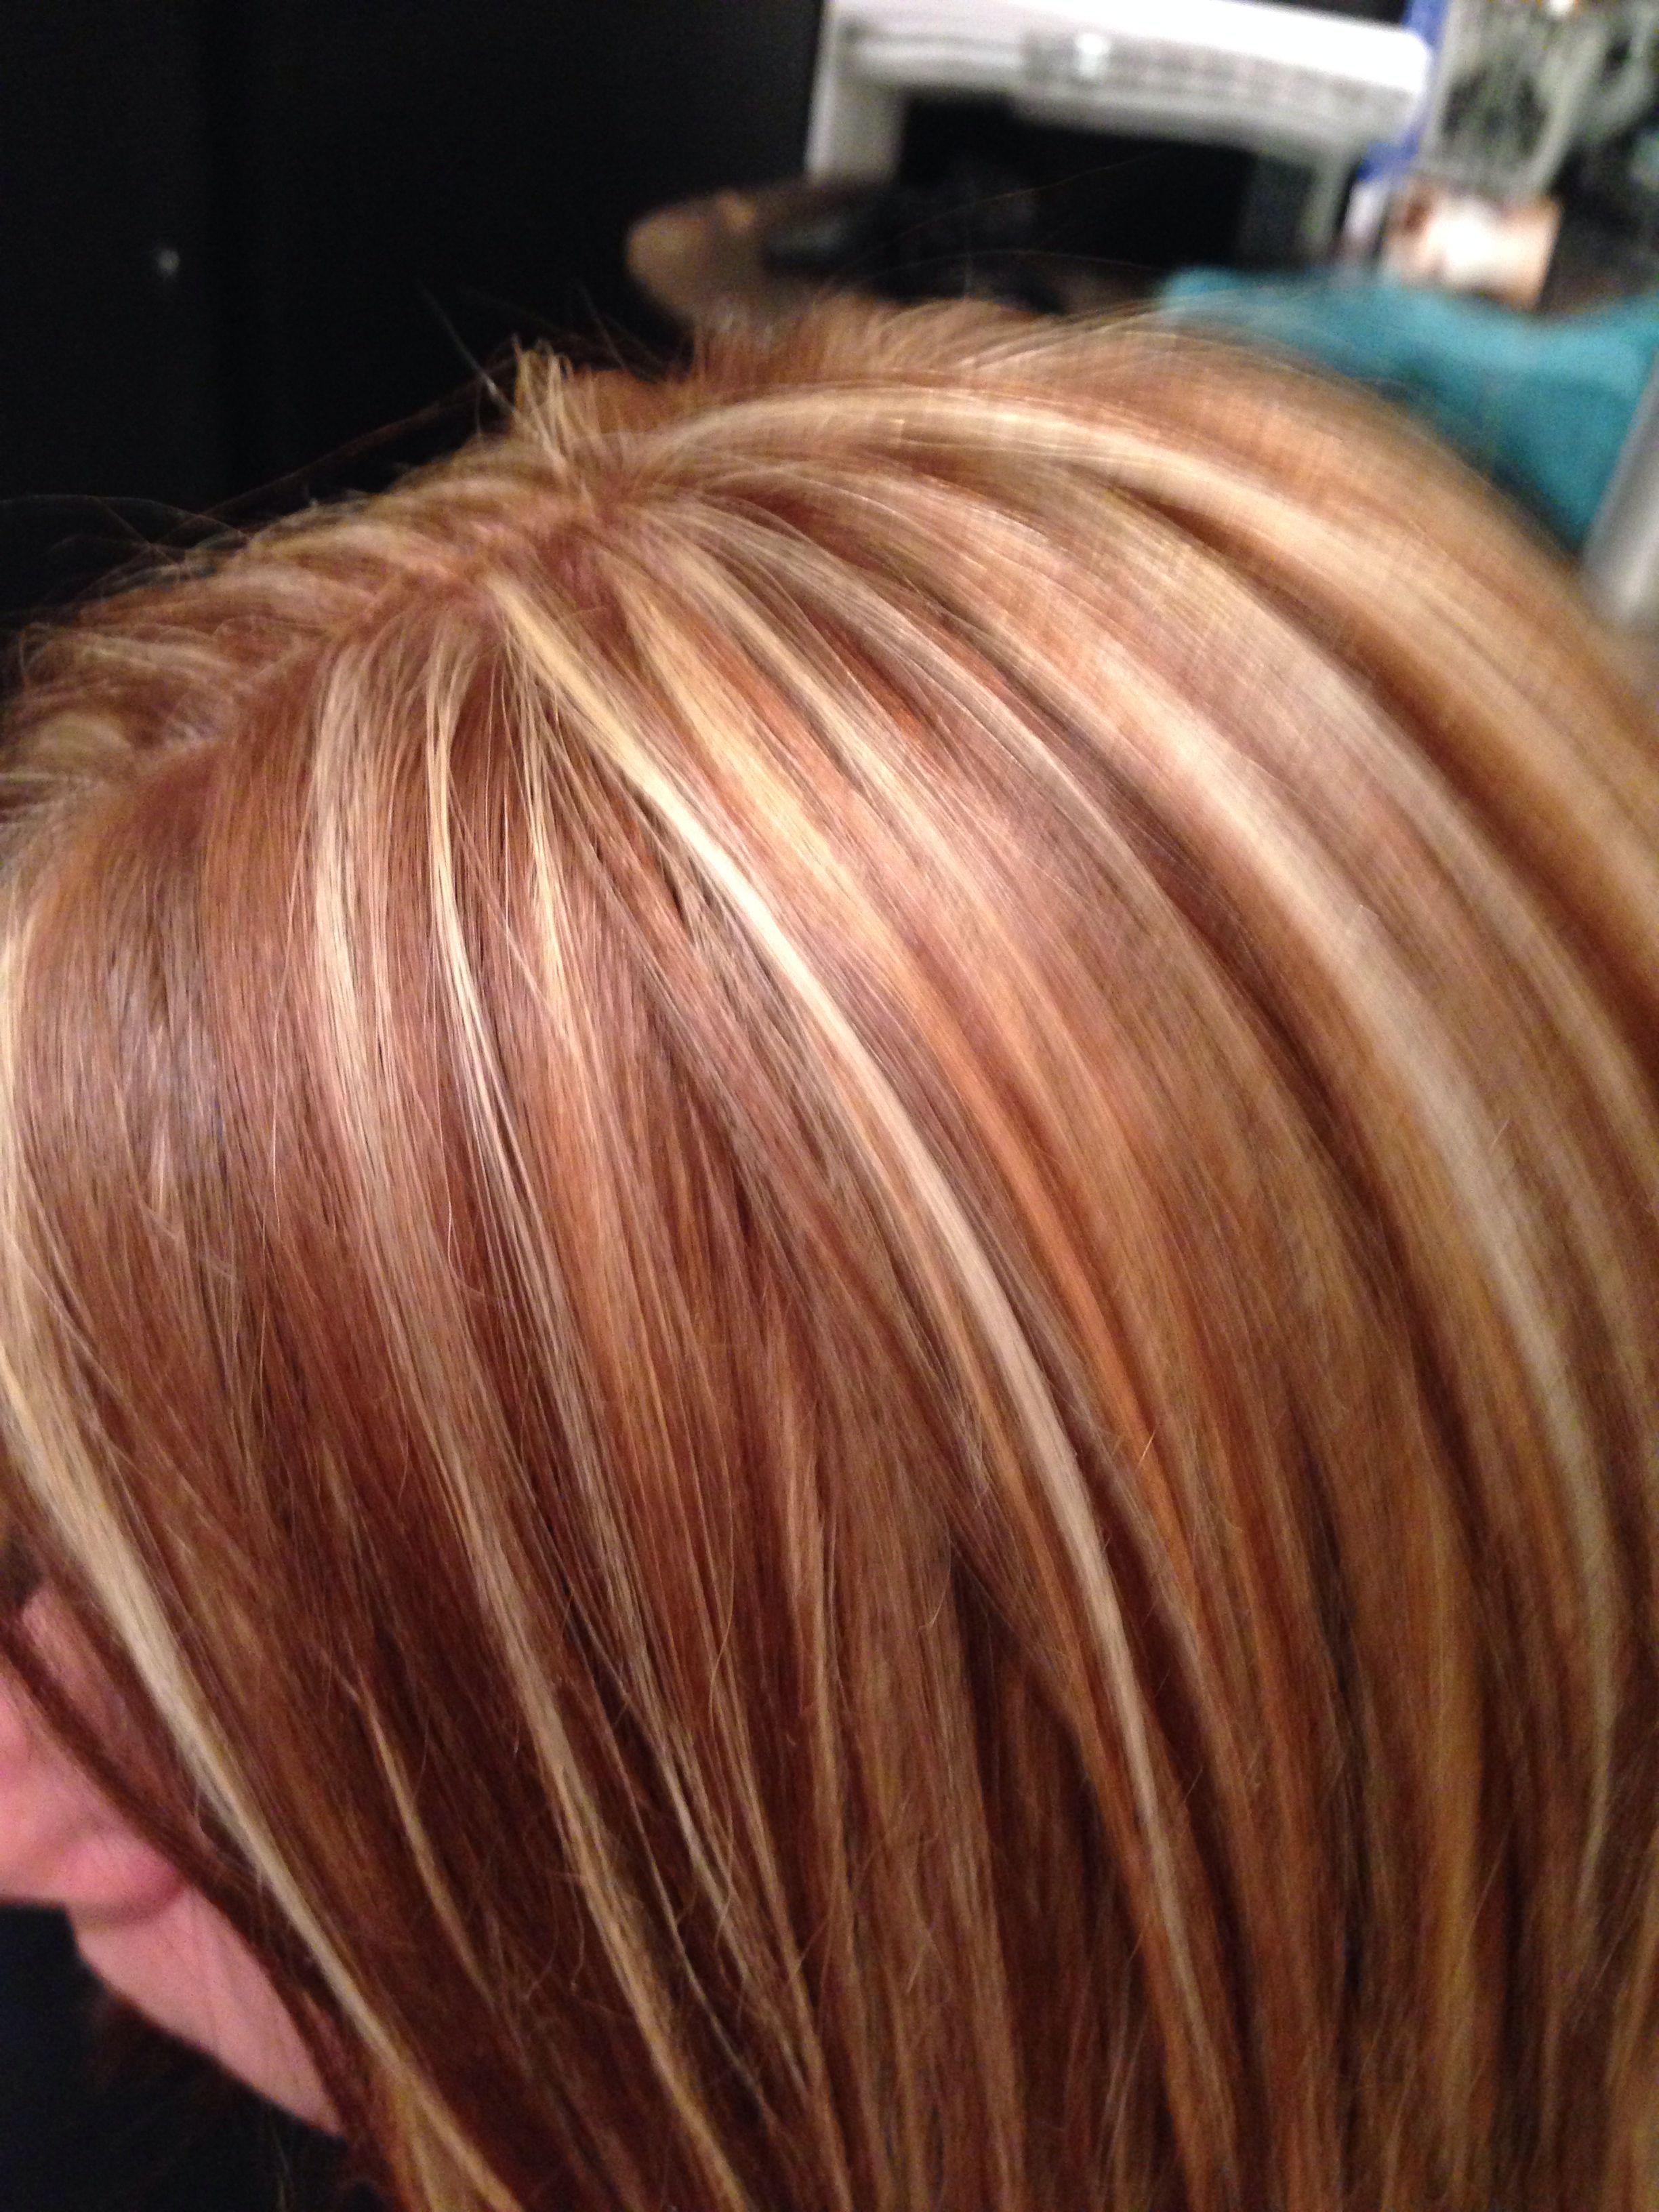 Blonde Red And Caramel Highlights Google Search Hair Highlights Long Hair Highlights Red Hair With Highlights